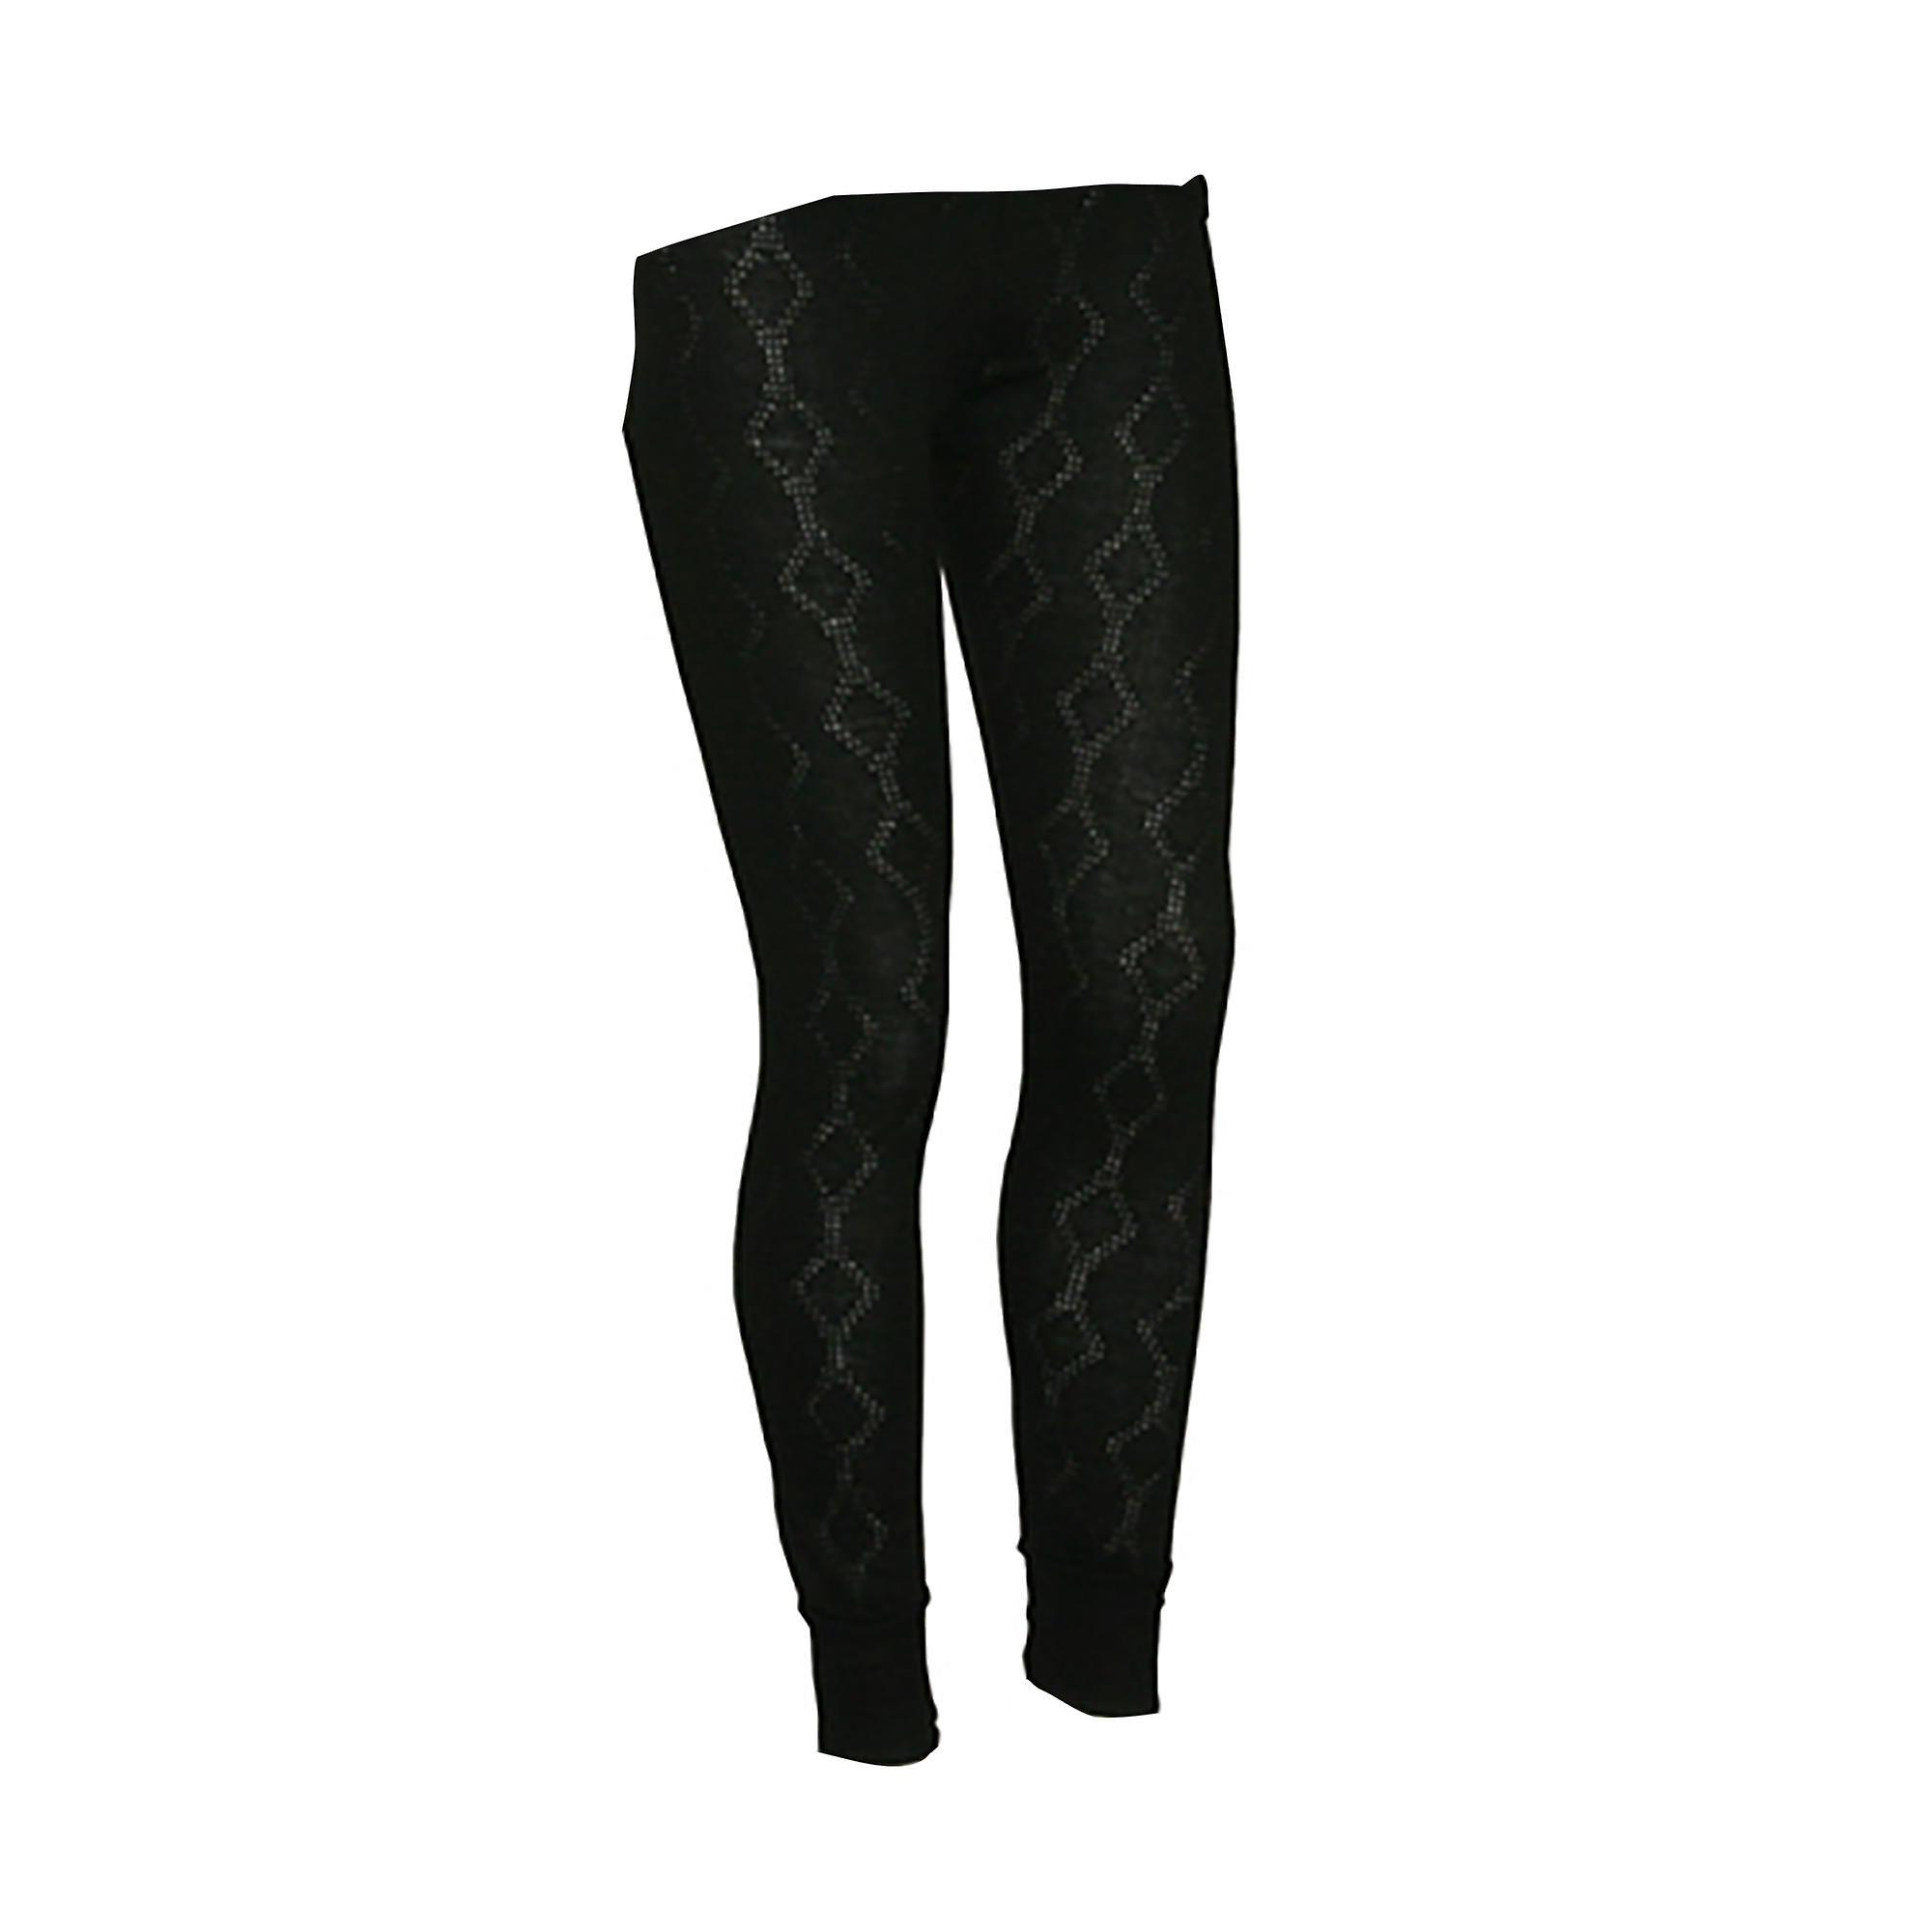 Ladies/Womens Thermal Wear Long Jane Polyviscose Range (British Made)